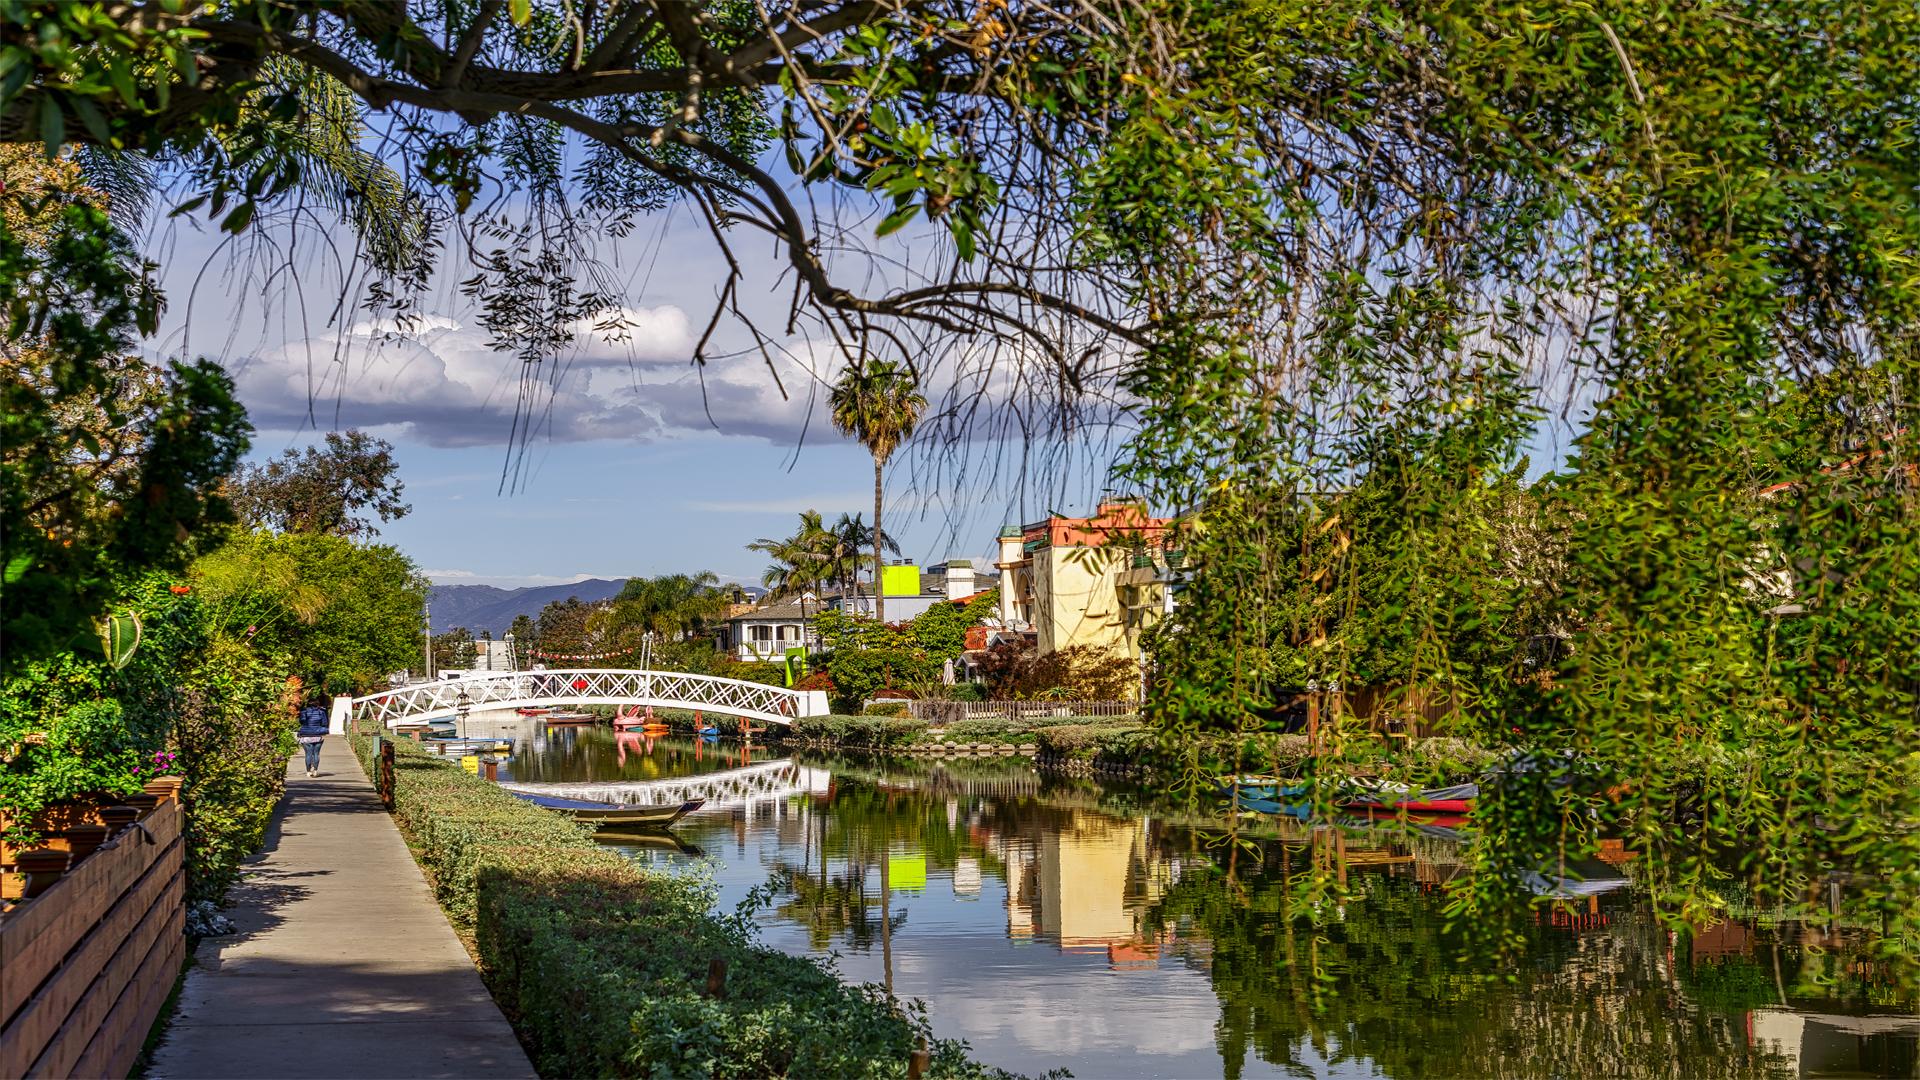 Venice Beach Canals7 2-14-18